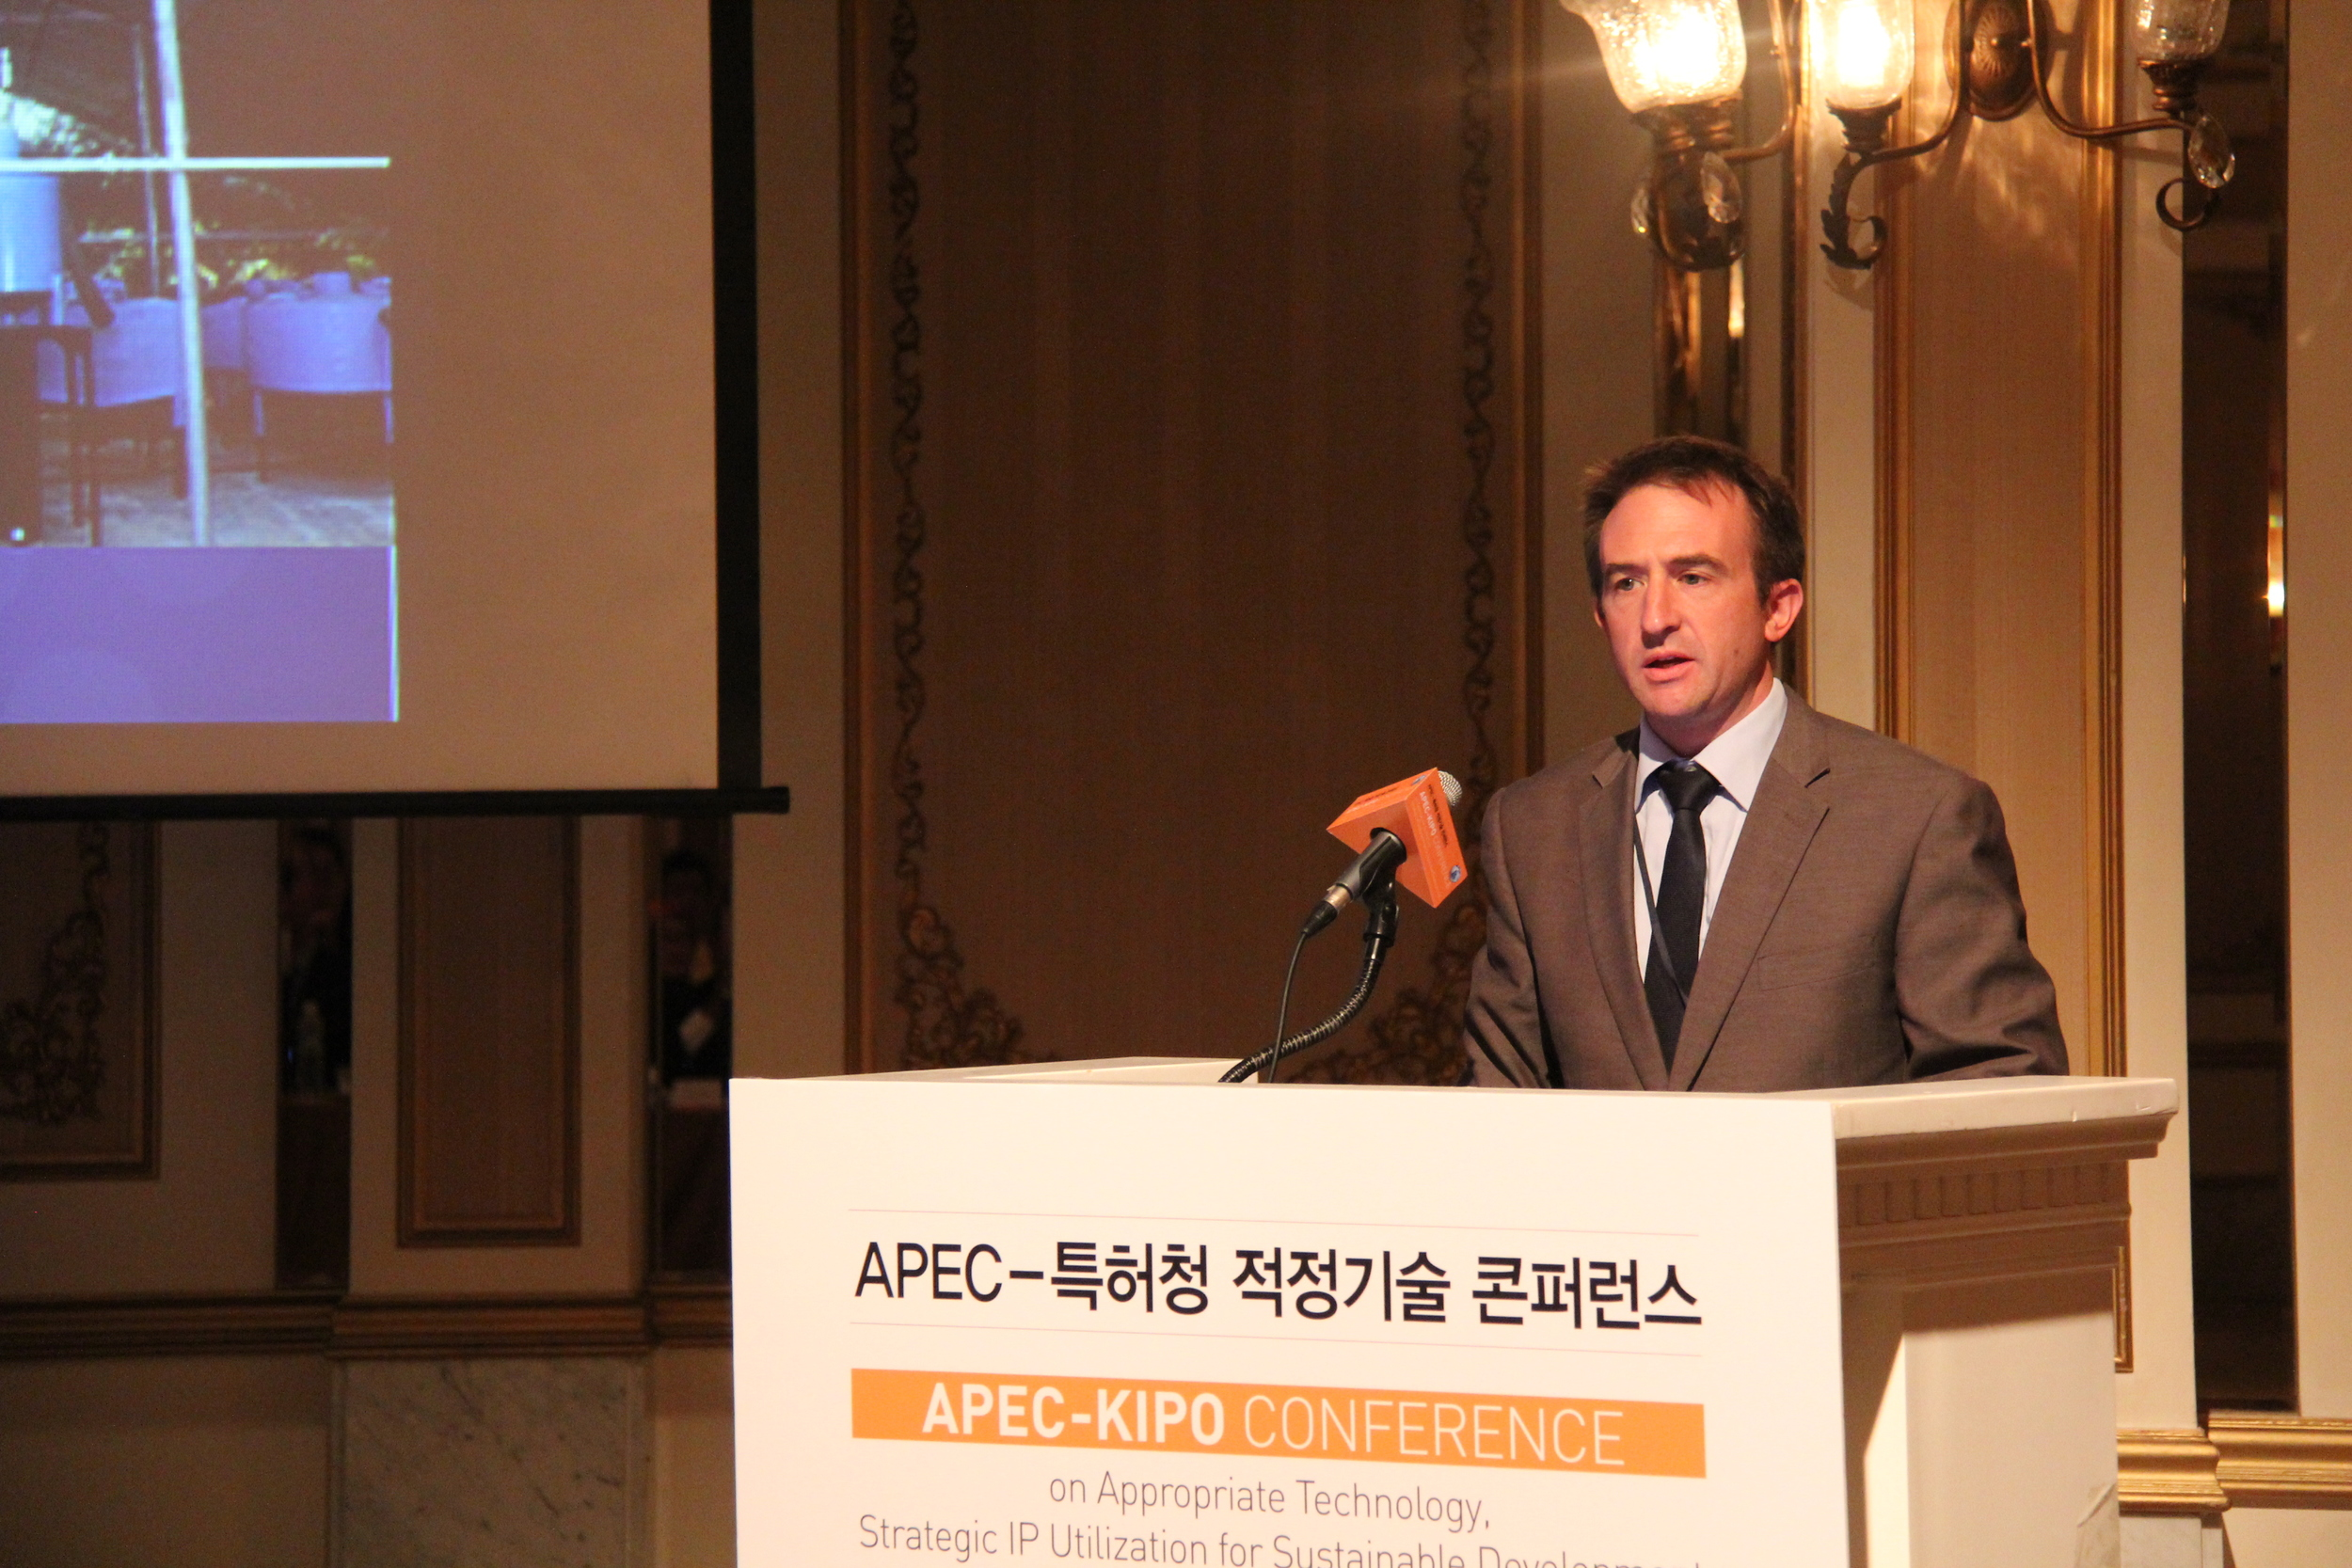 Lyndon Frearson, Managing Director of Ekistica, presents at the APEC Summit in 2014.